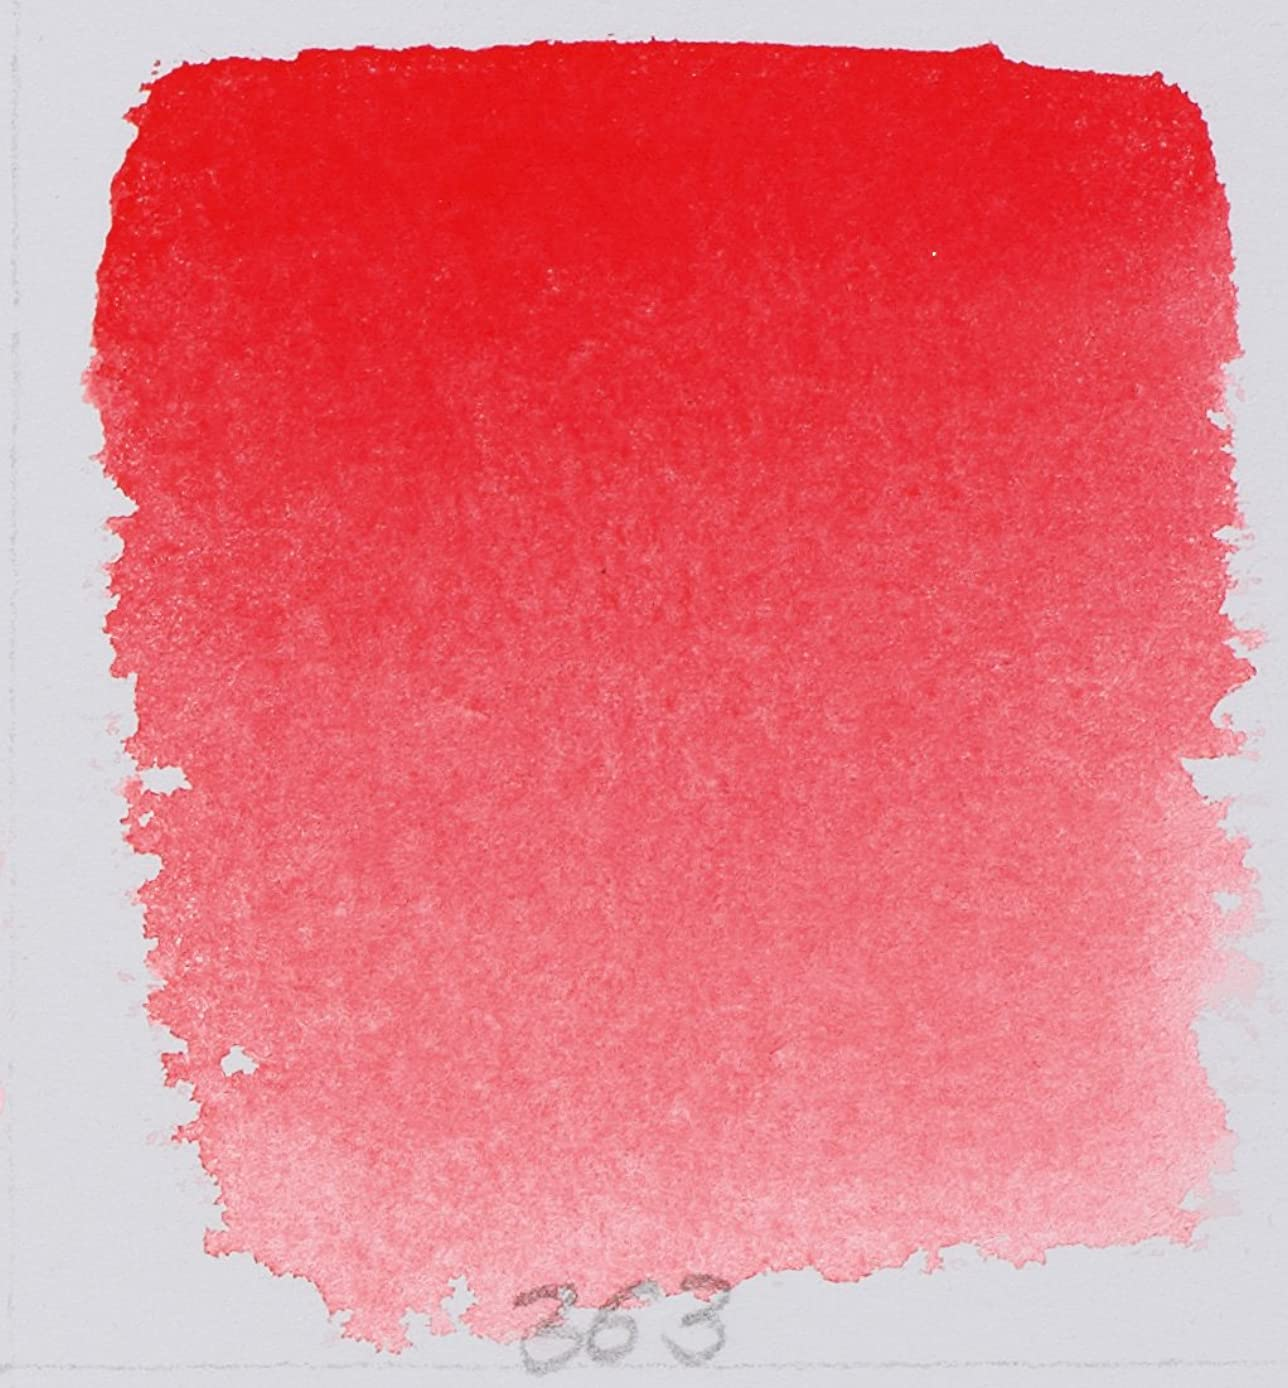 Schmincke Horadam Watercolor 15 ml Tube - Scarlet Red